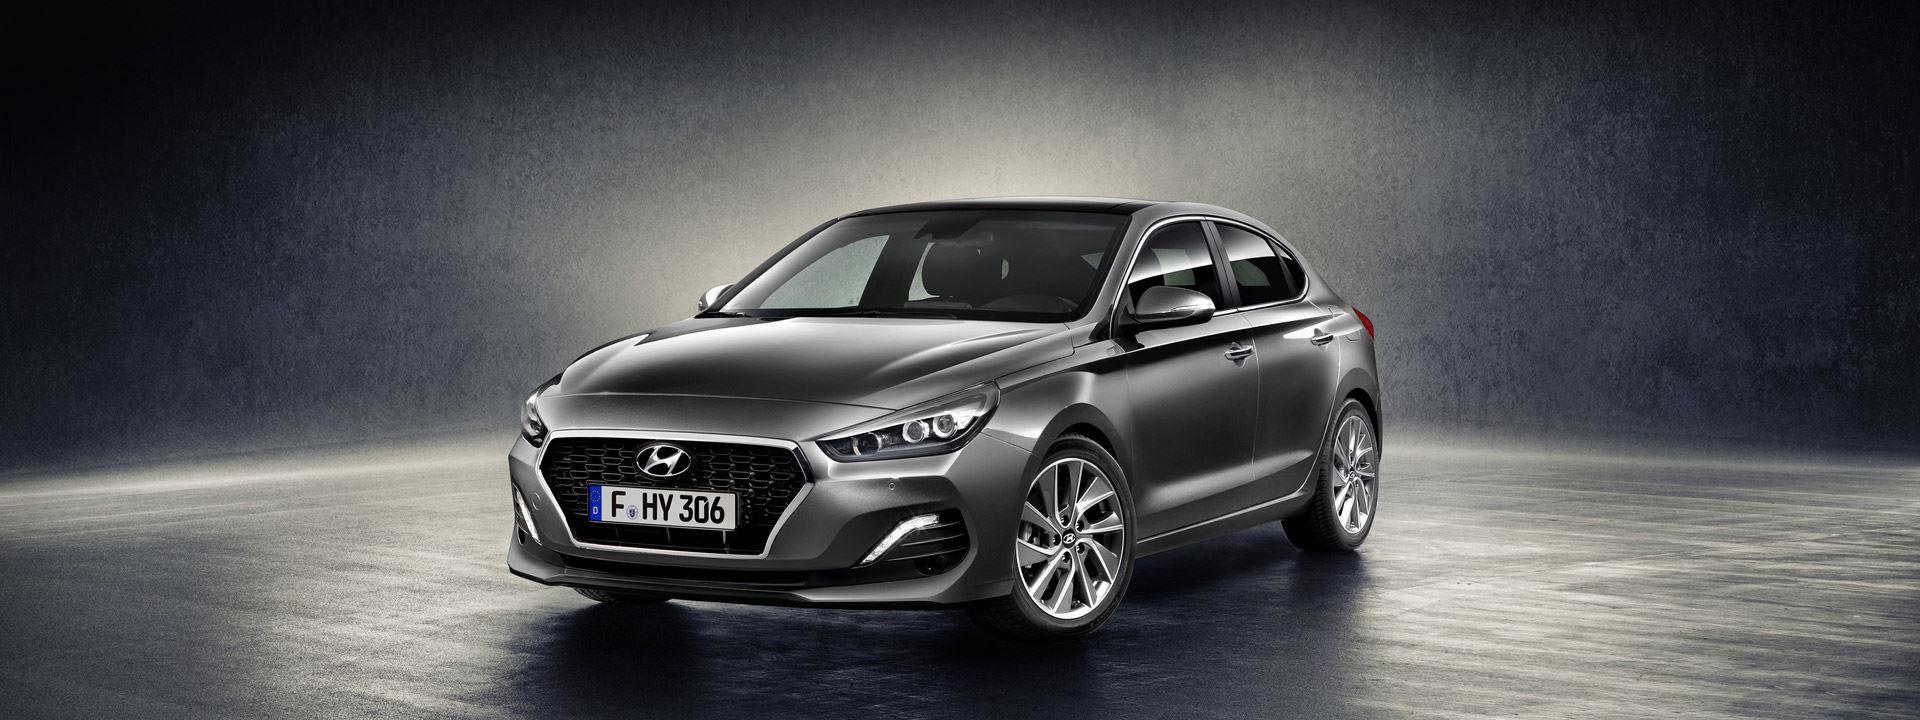 De geheel nieuwe Hyundai i30 Fastback: vol charisma en dynamiek.